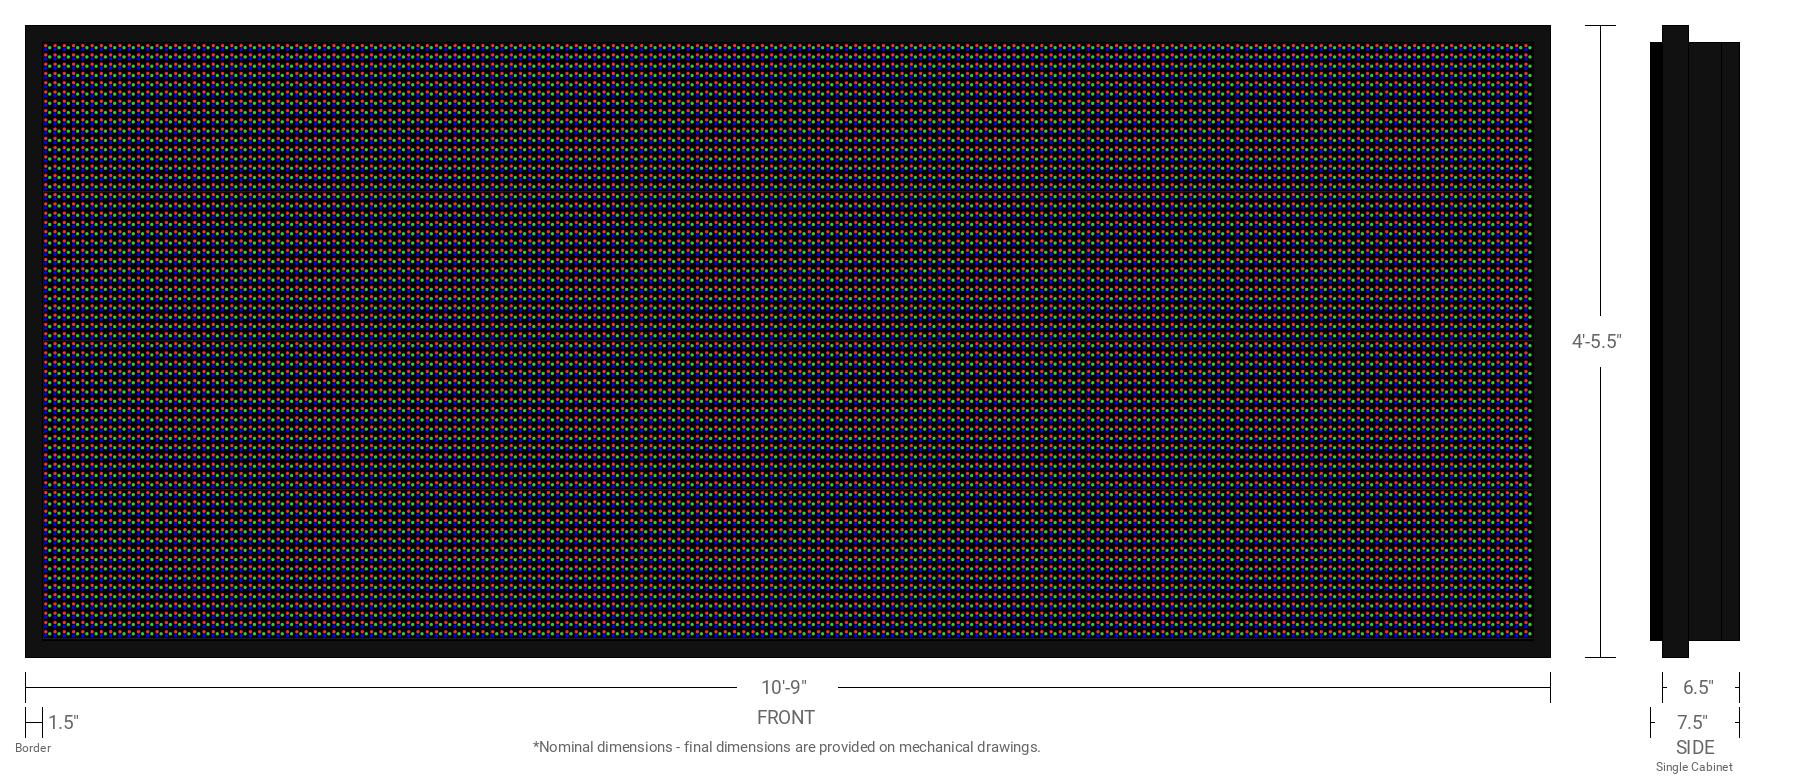 Polaris 20mm 64x160 Single Sided Full Color LED Display